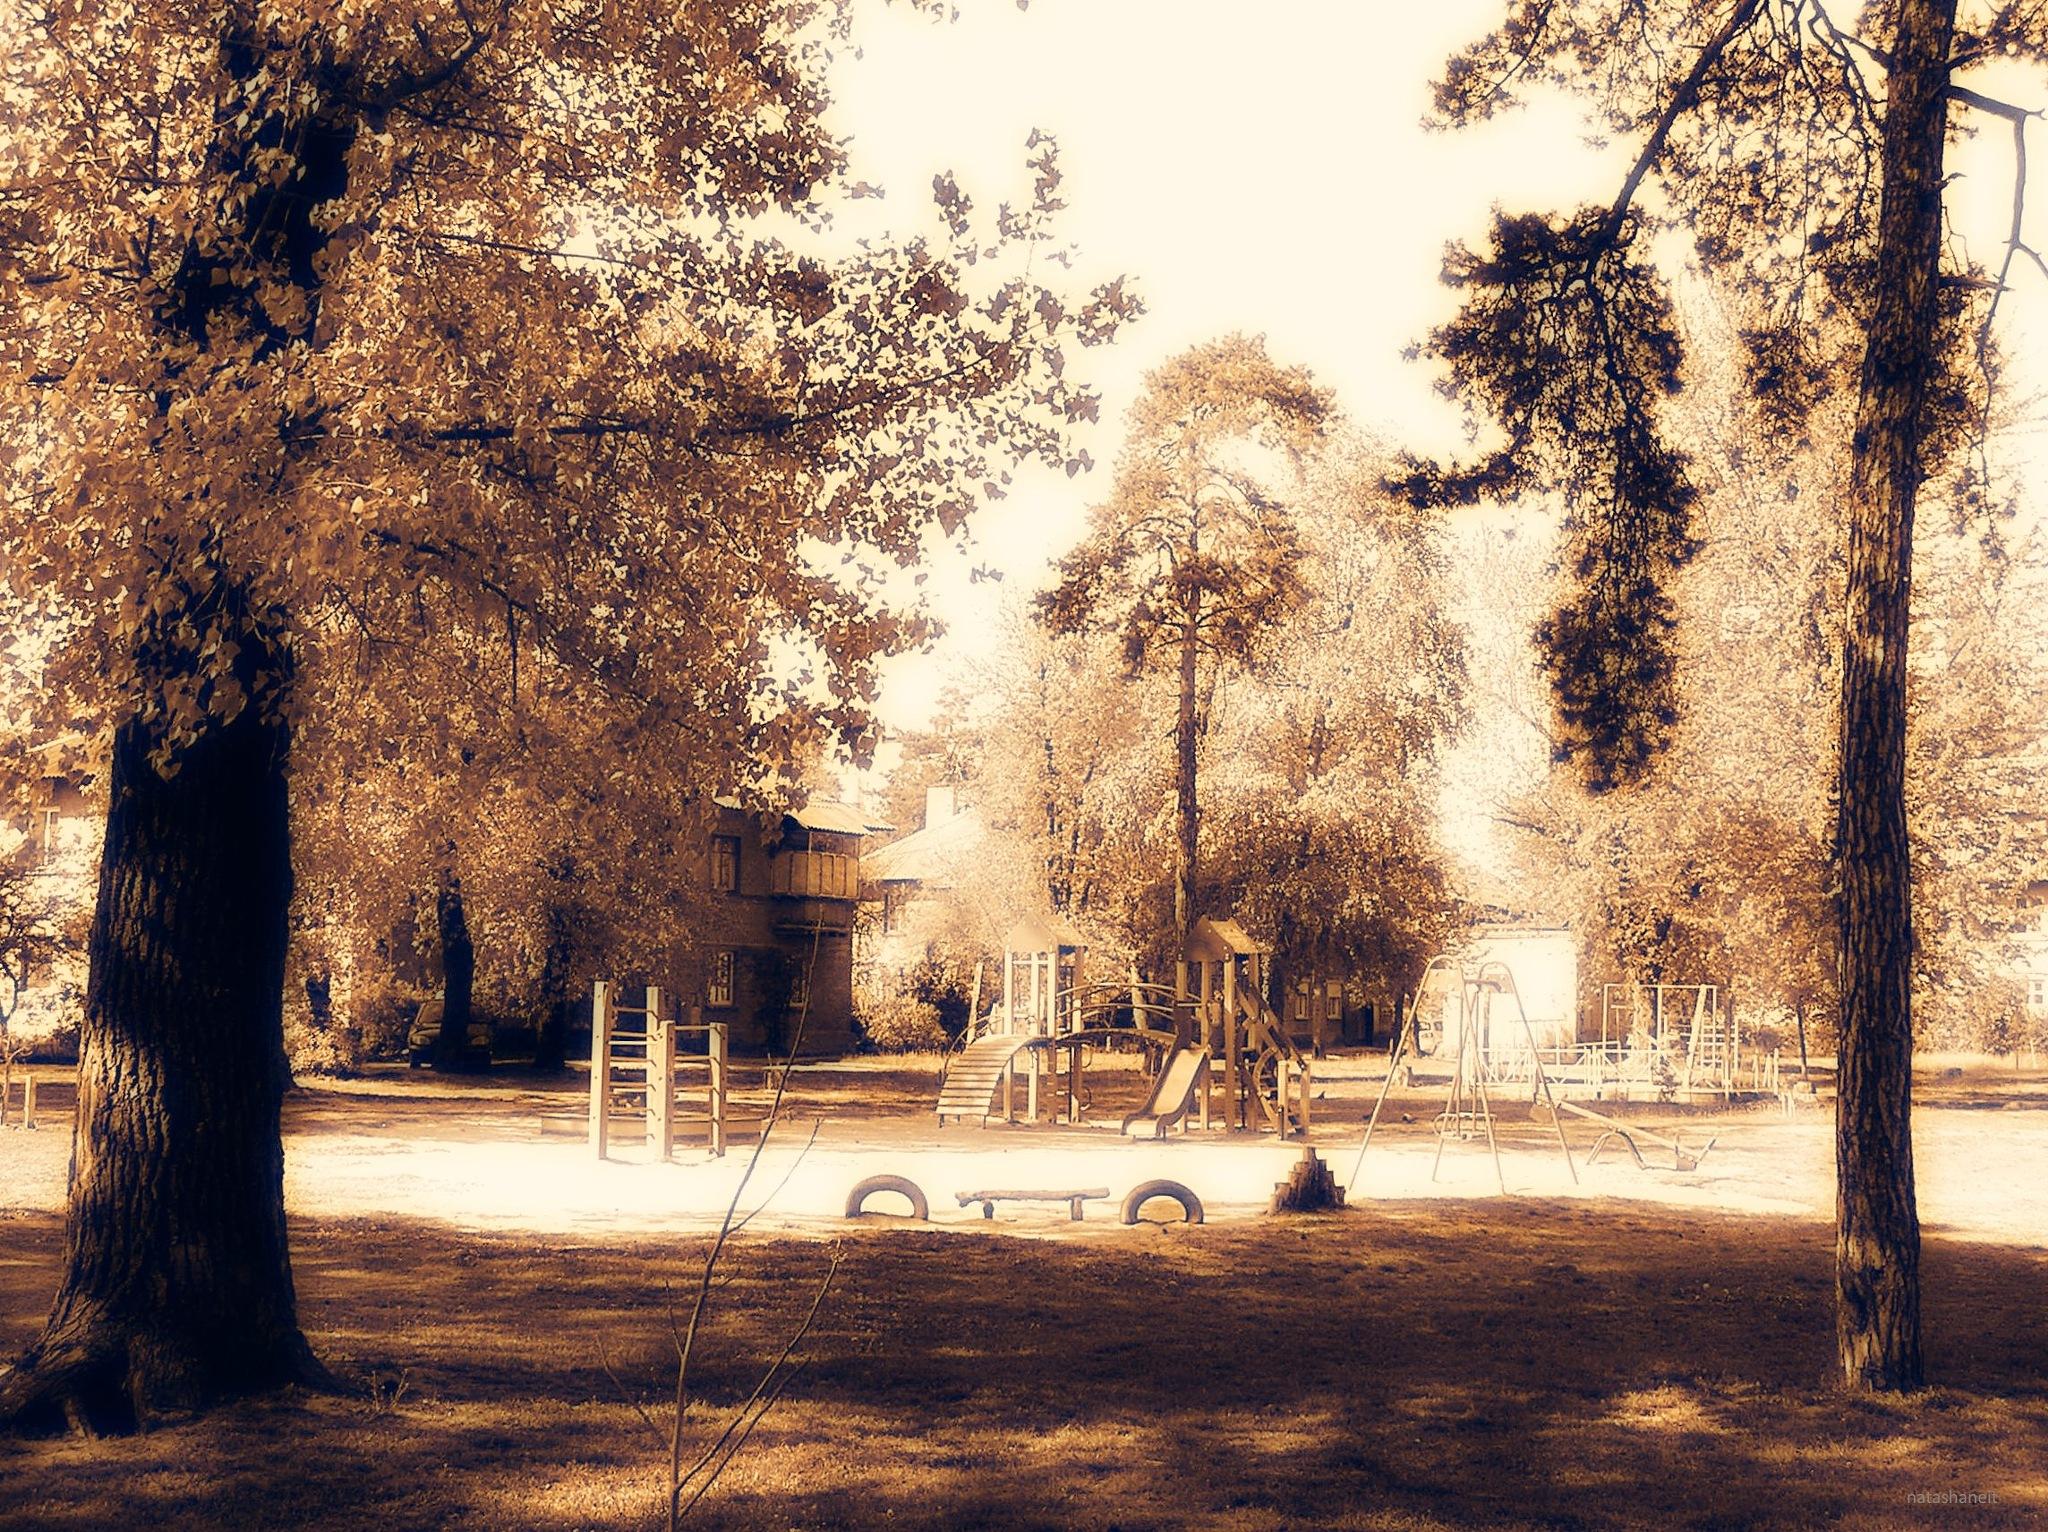 Children's playground in the yard by natashaneit